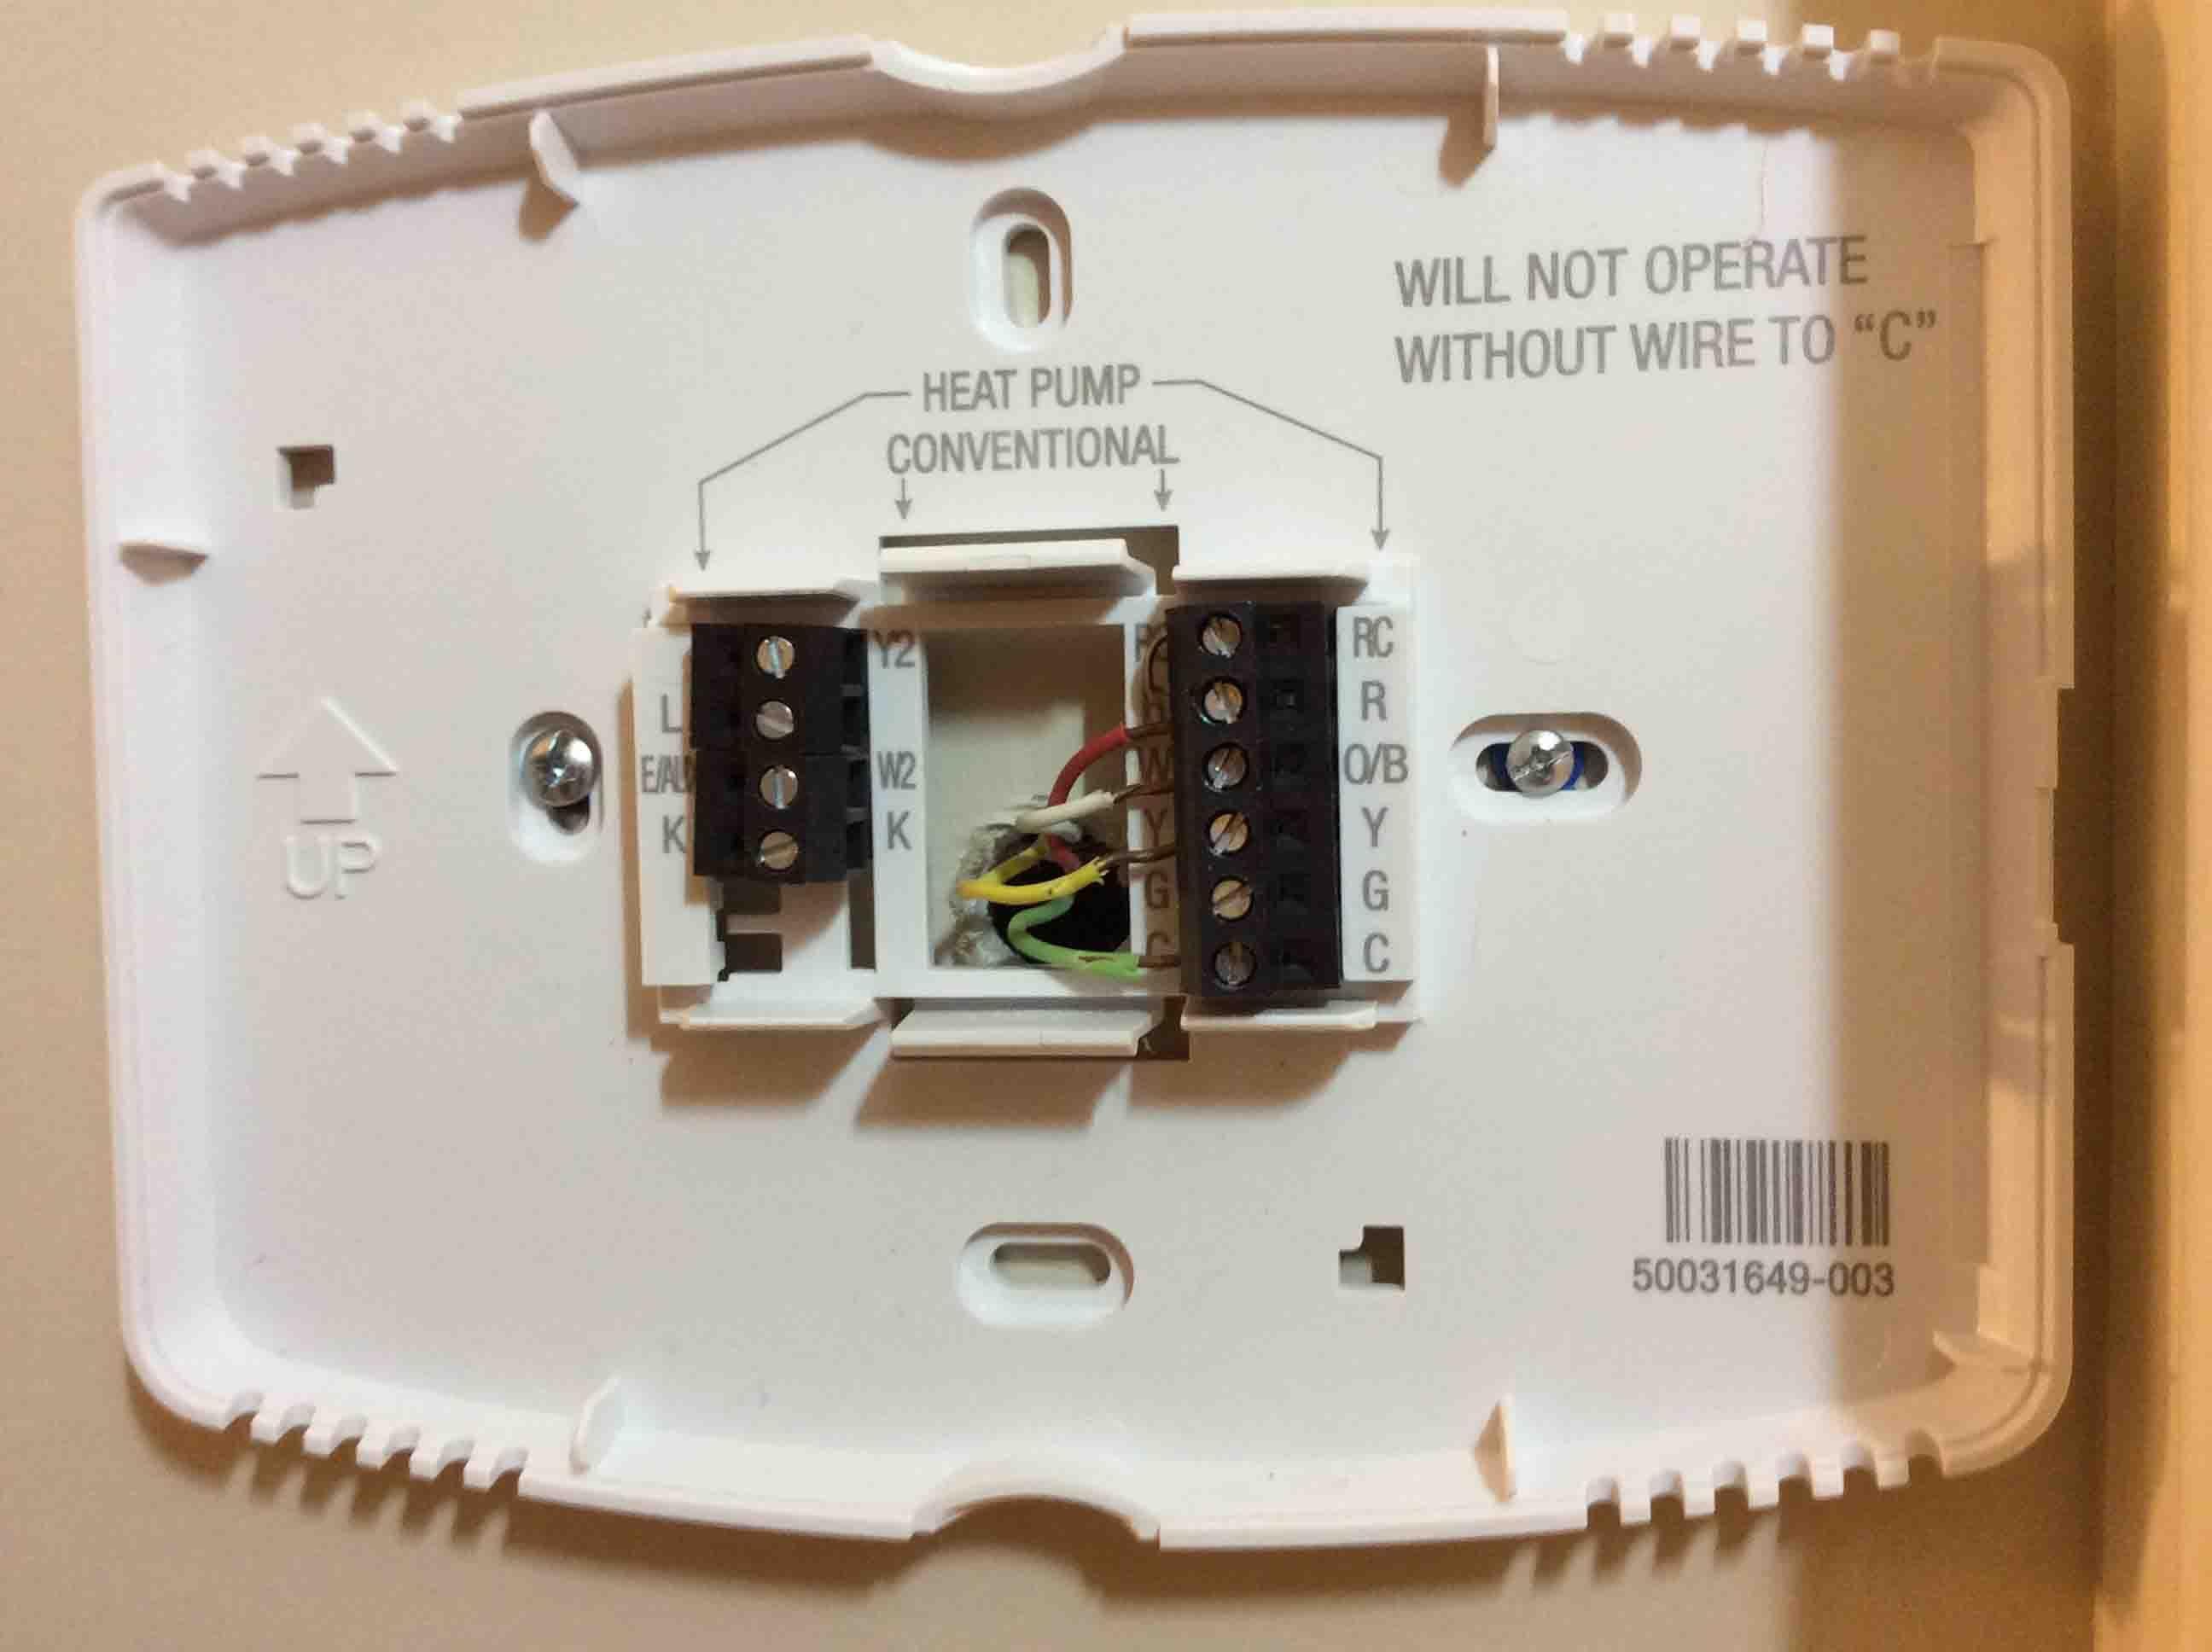 Astounding Honeywell Smart Thermostat Wiring Instructions Rth9580Wf Toms Tek Wiring Cloud Vieworaidewilluminateatxorg